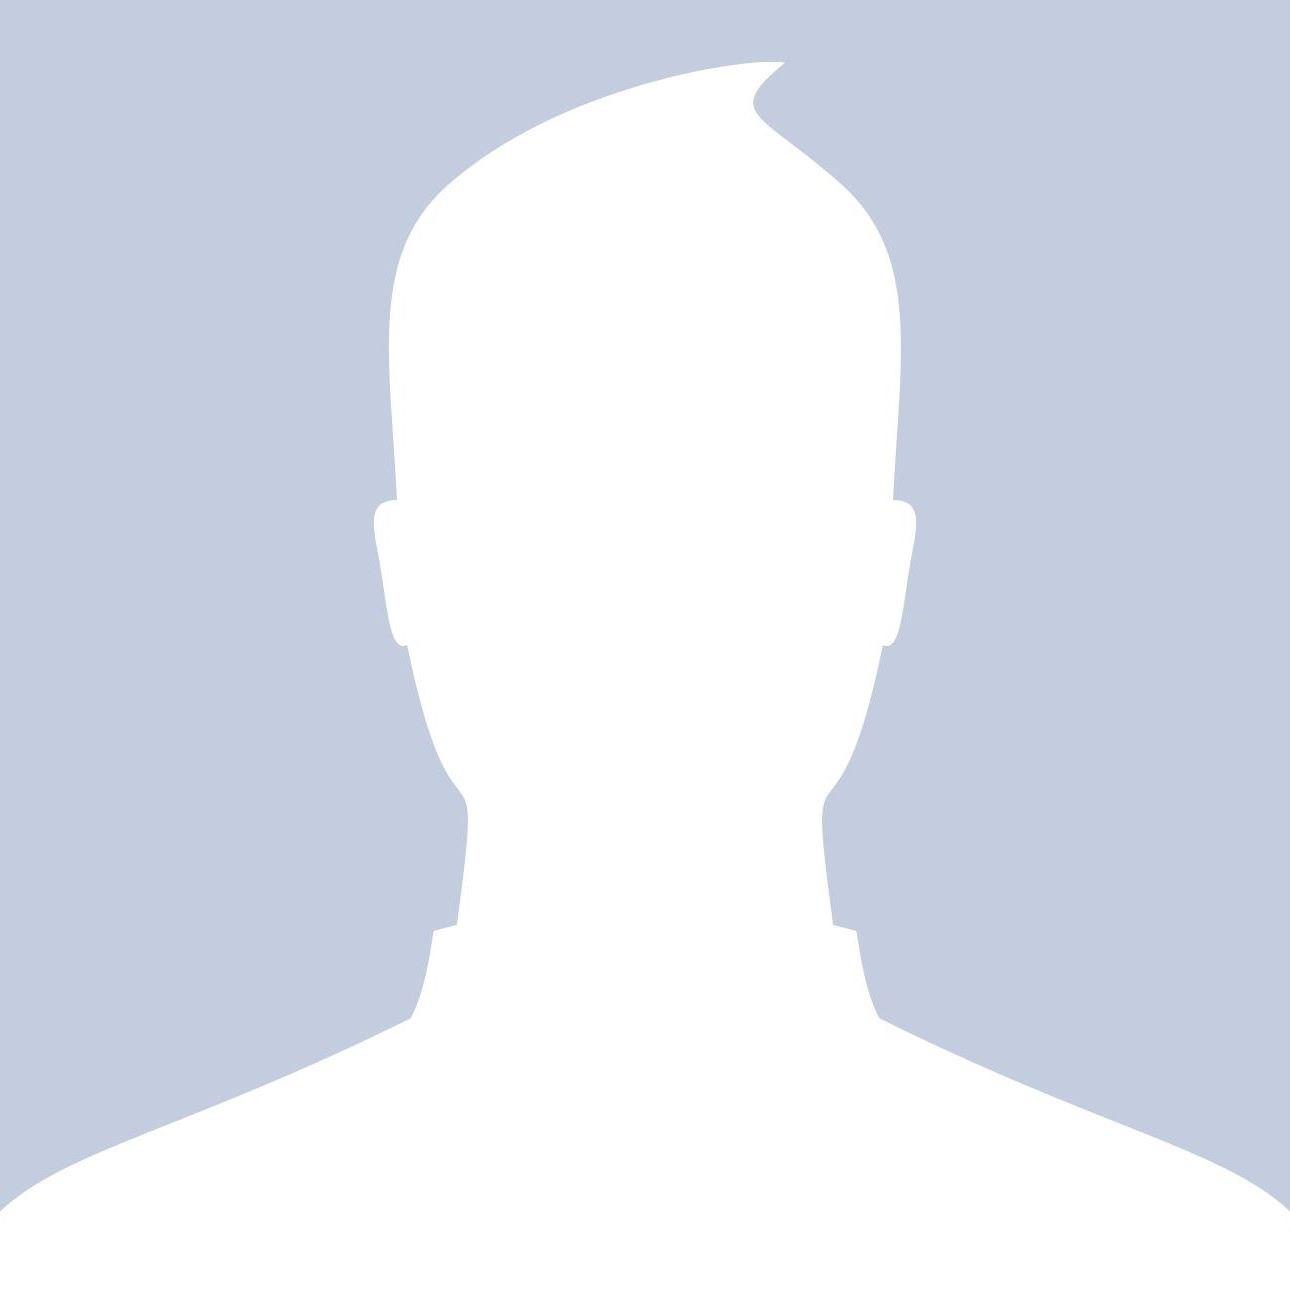 facebook-profile-icon-free-icons-regarding-facebook-profile-icon-female.jpg